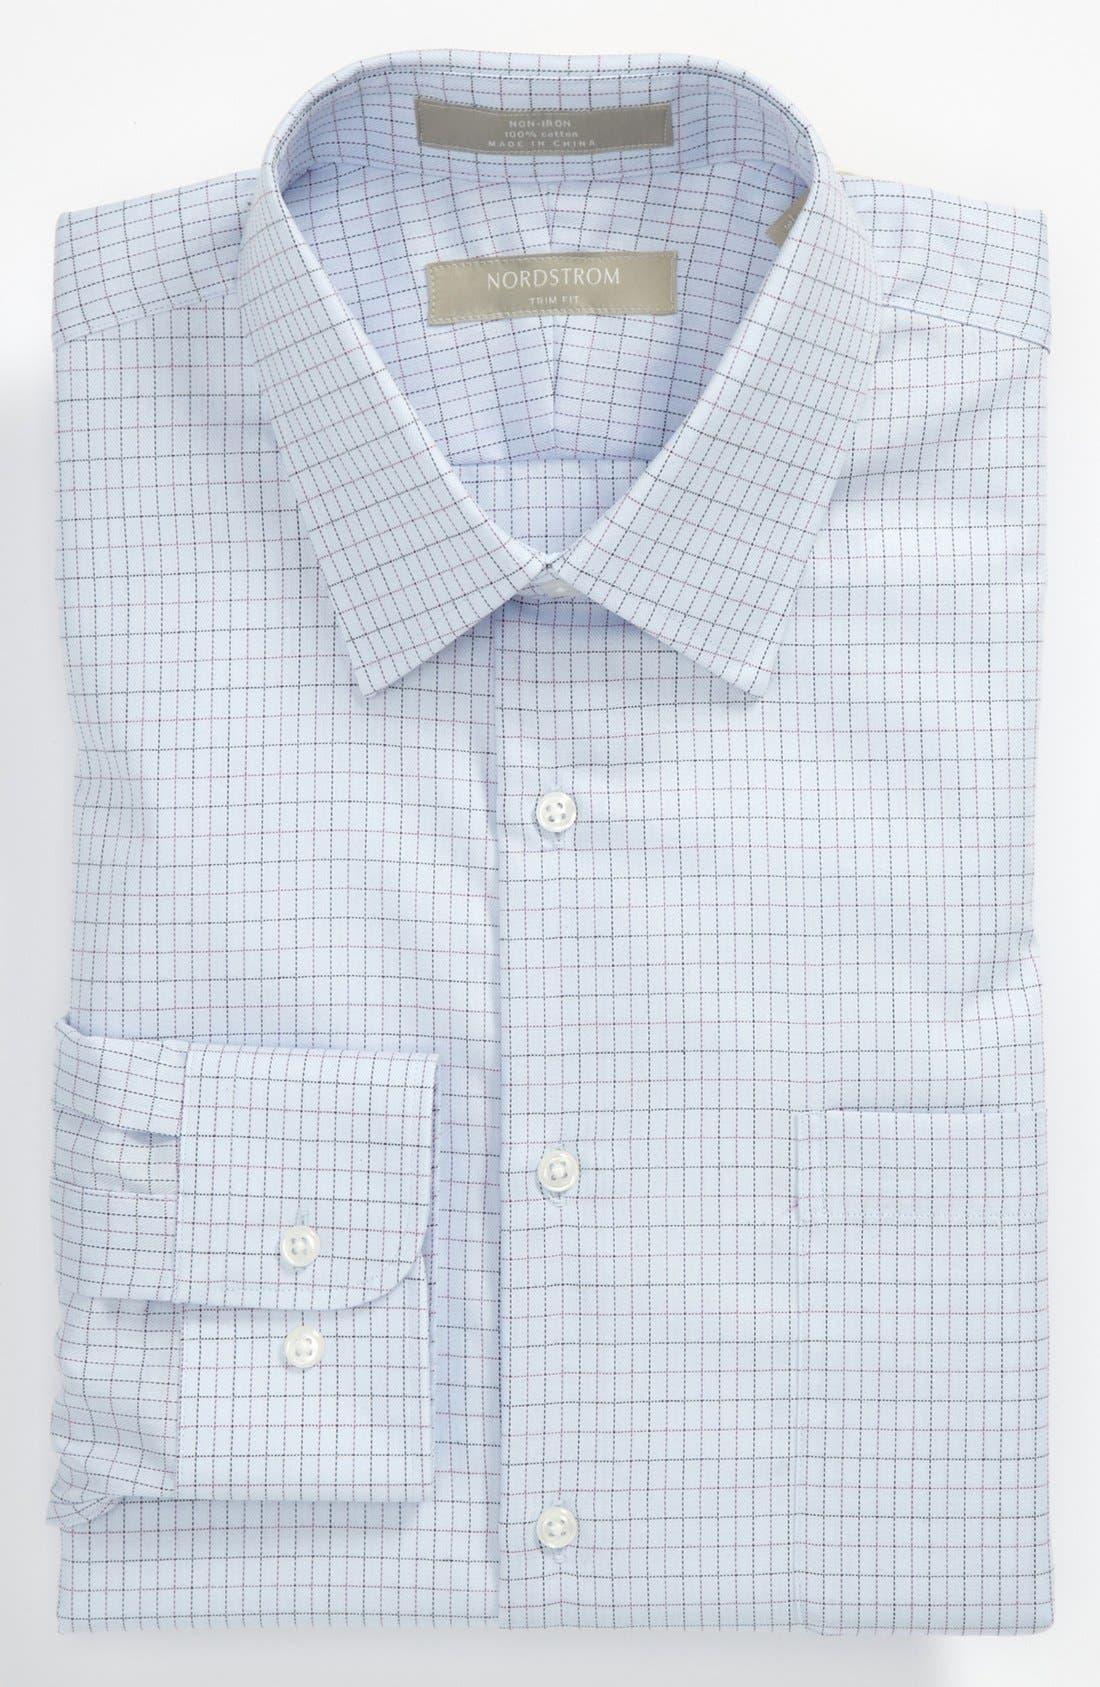 Main Image - Nordstrom Trim Fit Dress Shirt